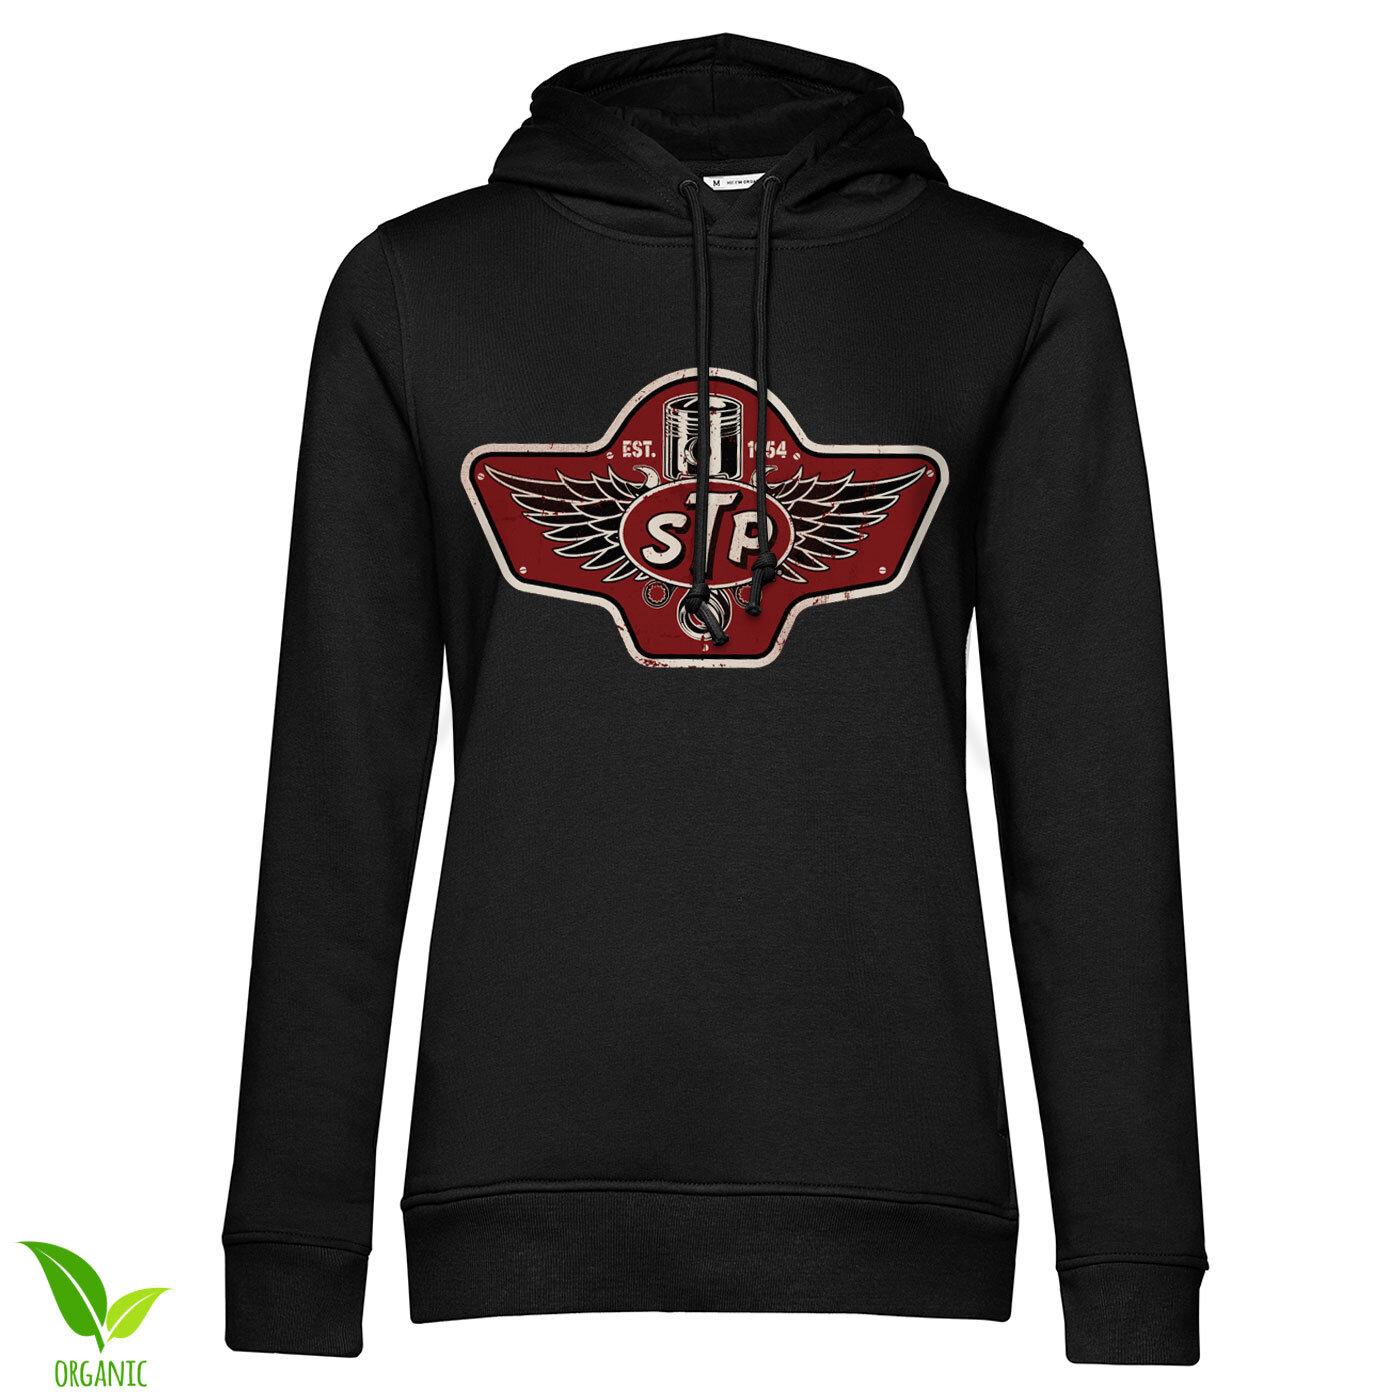 STP Piston Emblem Girls Hoodie